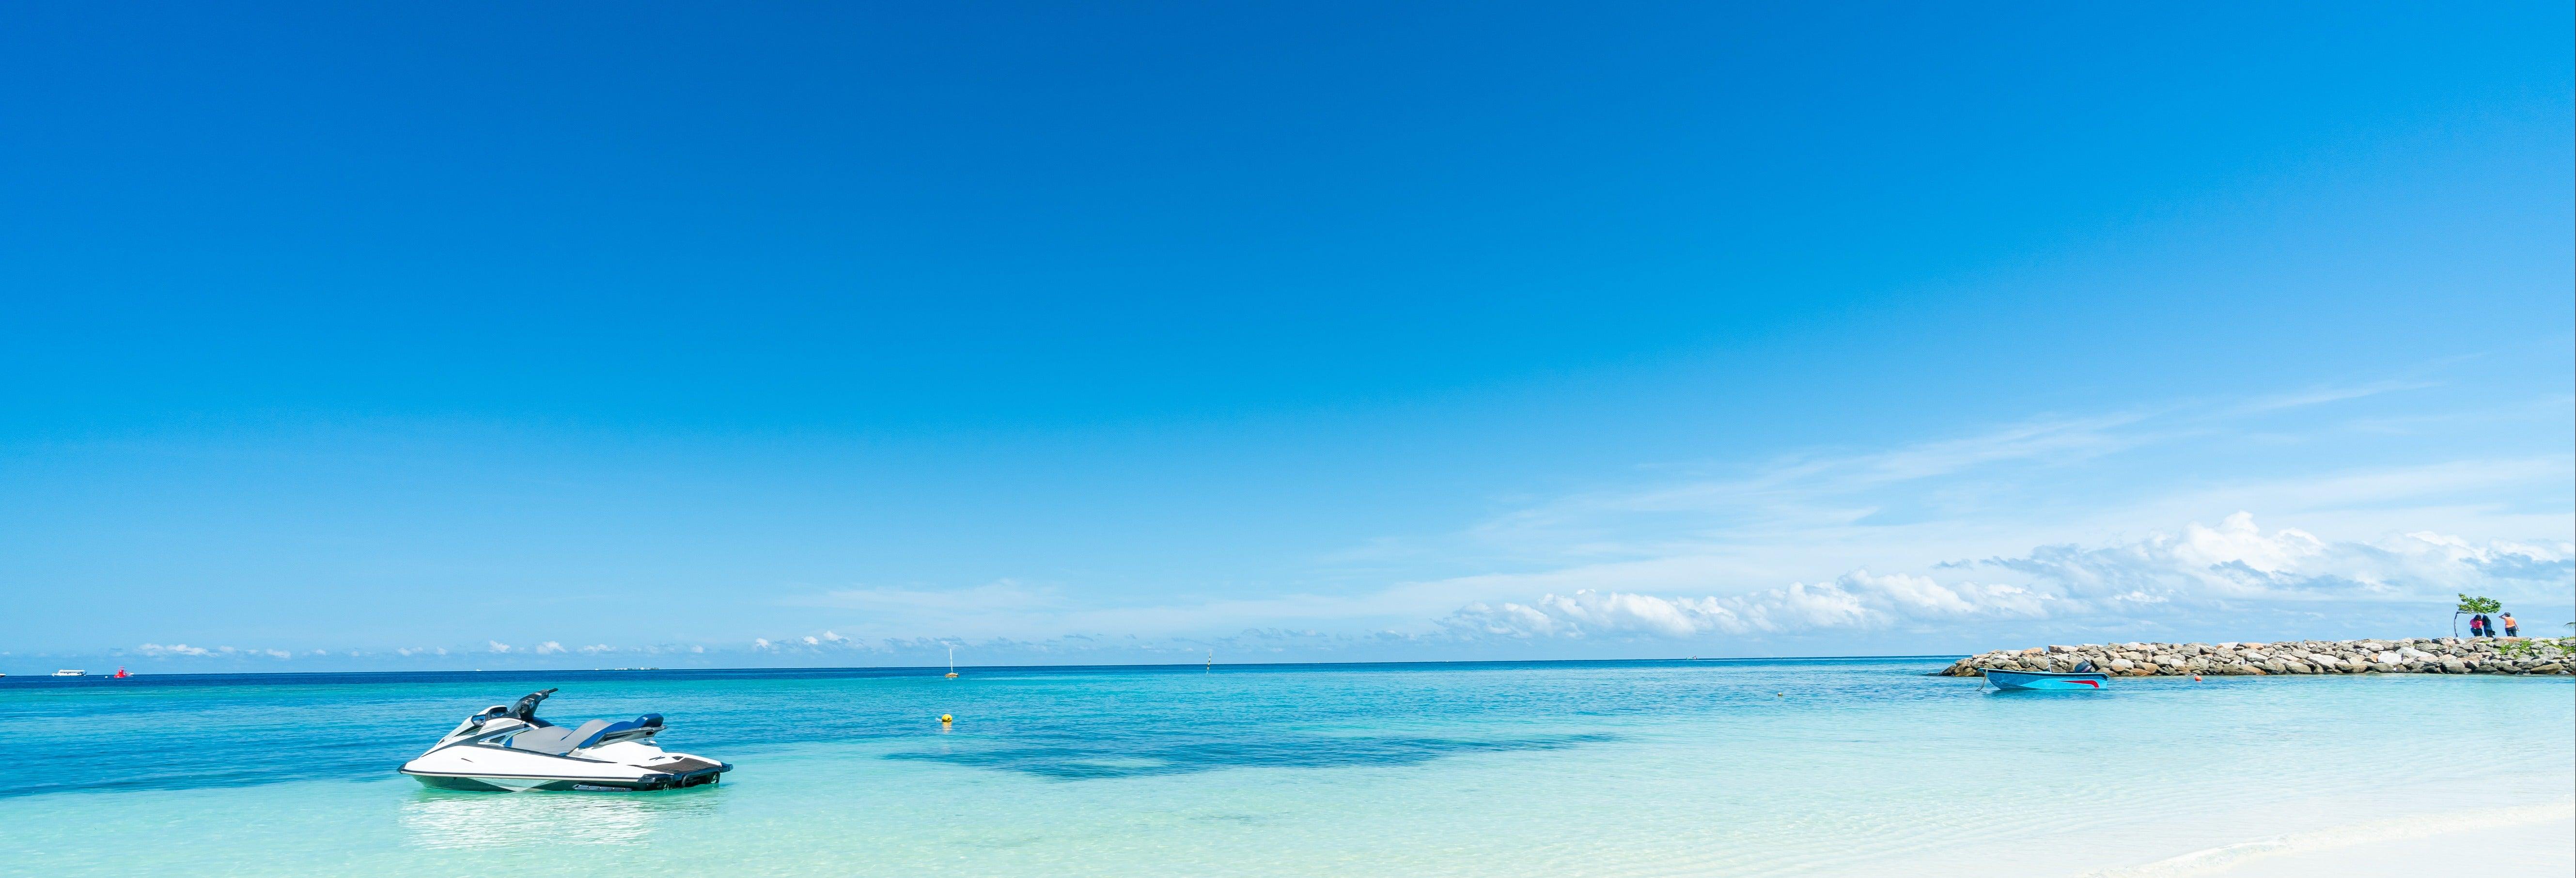 Esquí acuático o wakeboard en Maafushi